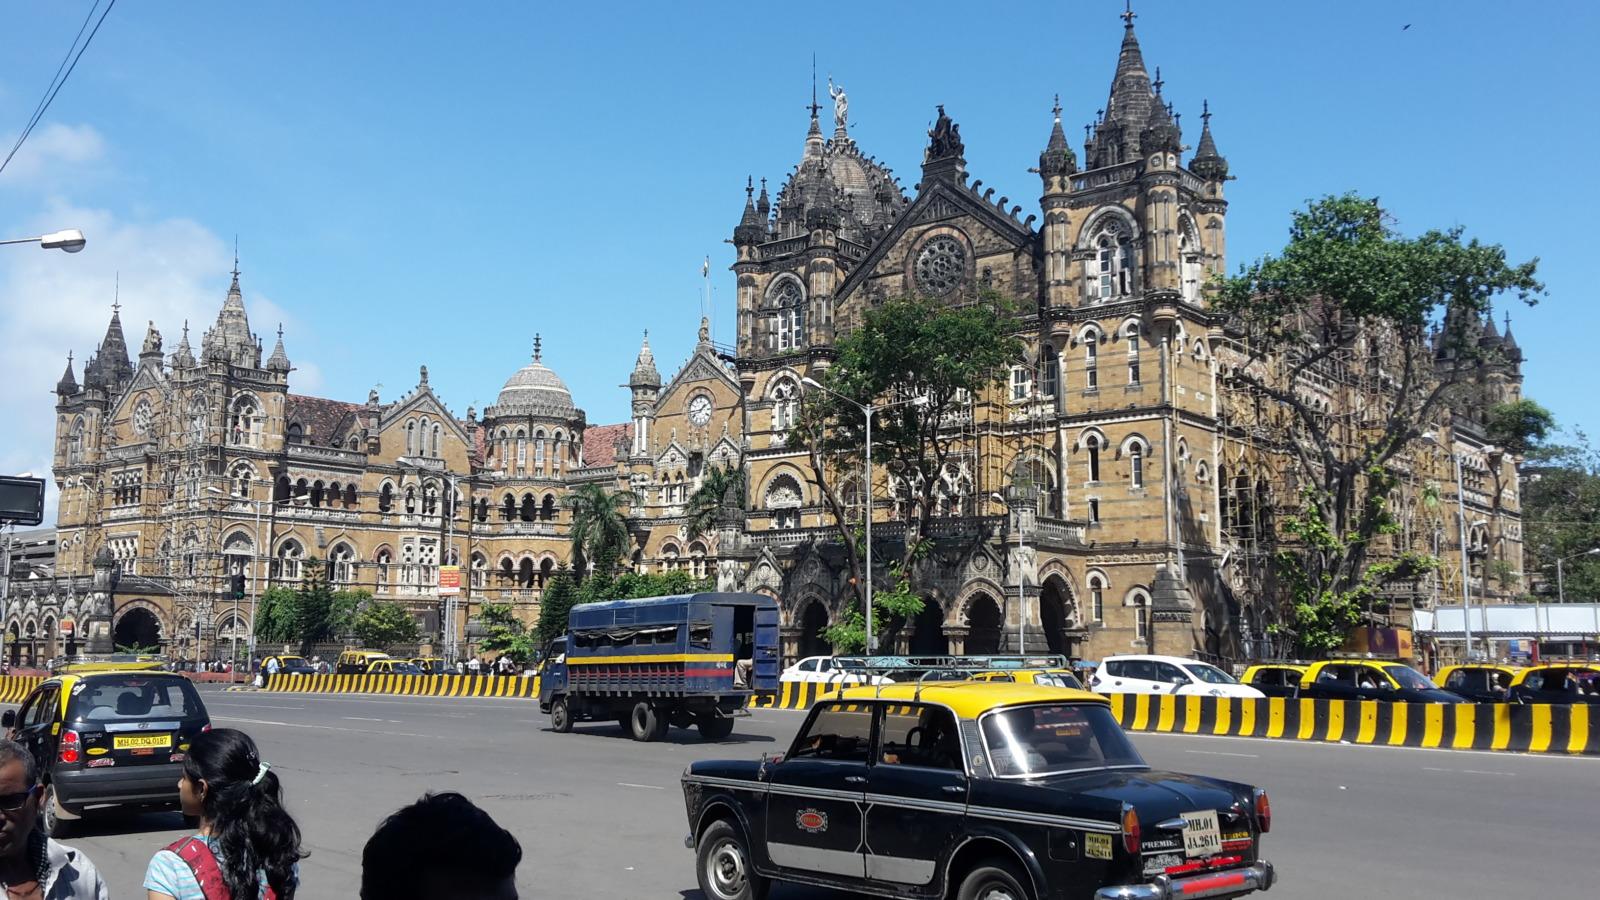 Chatropati Shivaji railway station in Mumbai